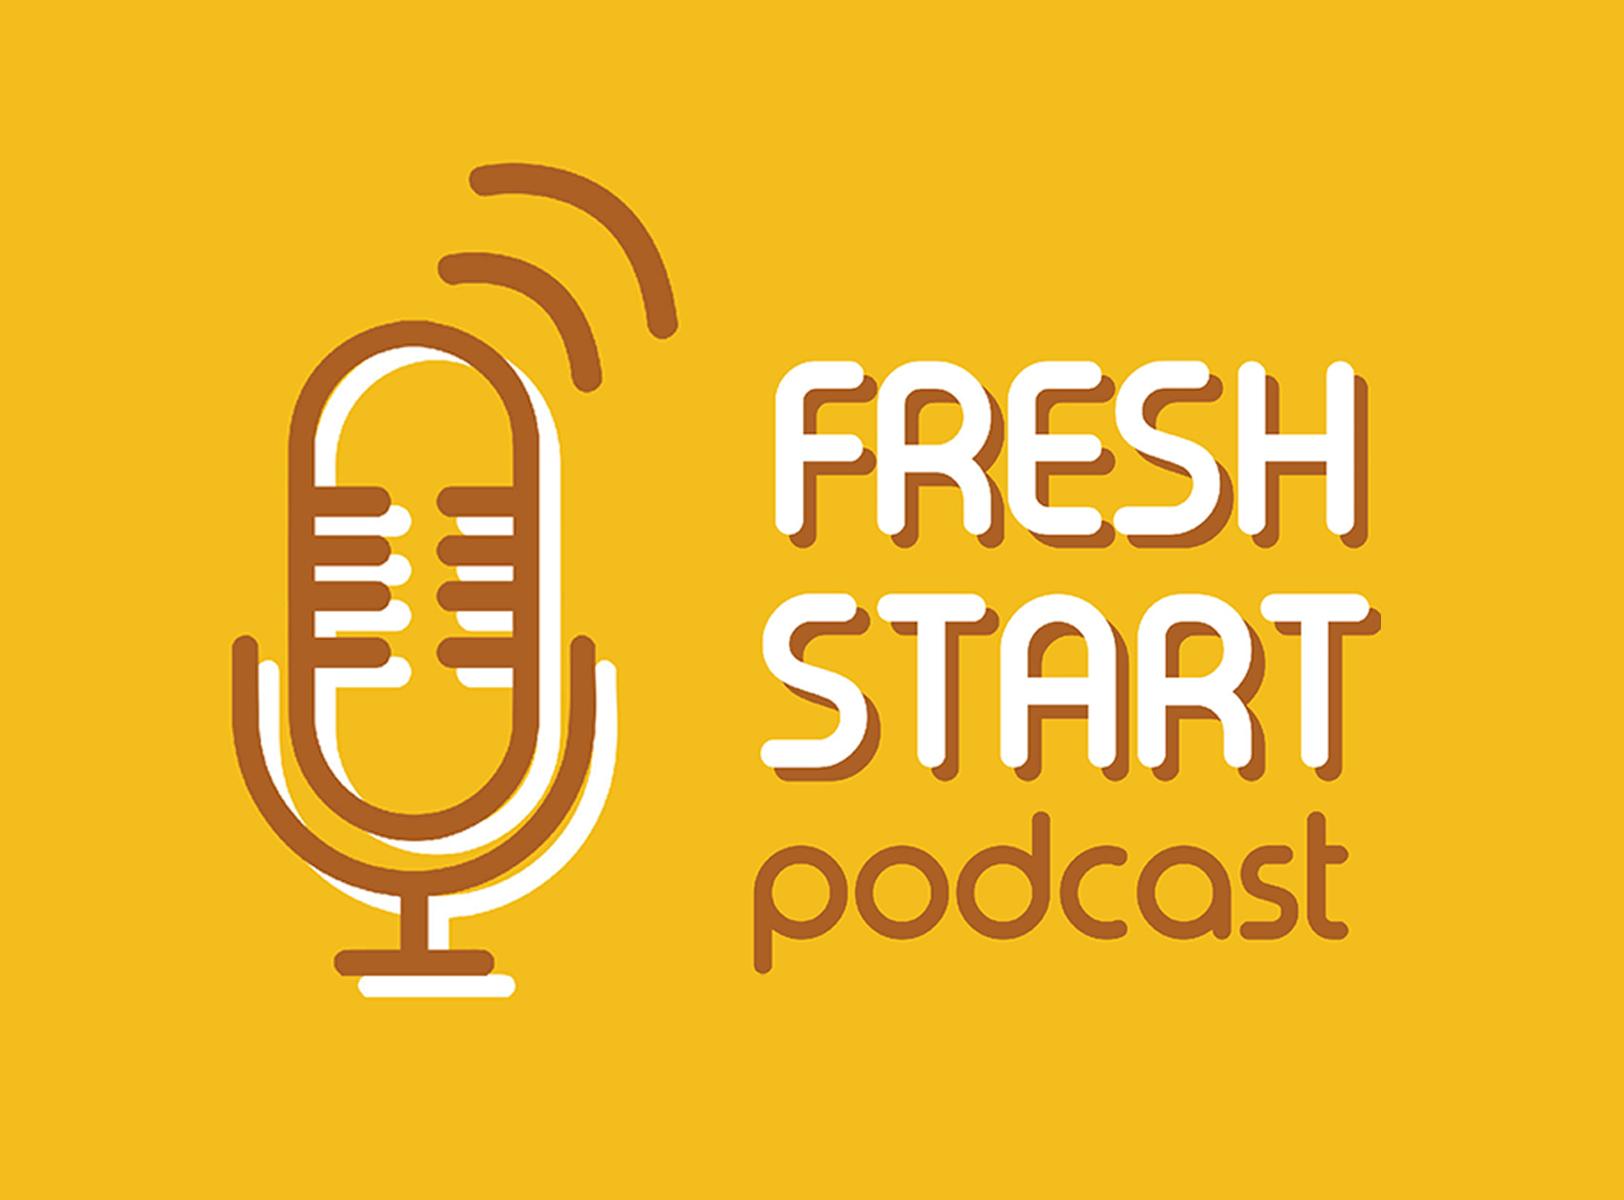 Fresh Start: Podcast News (8/30/2018 Thu.)